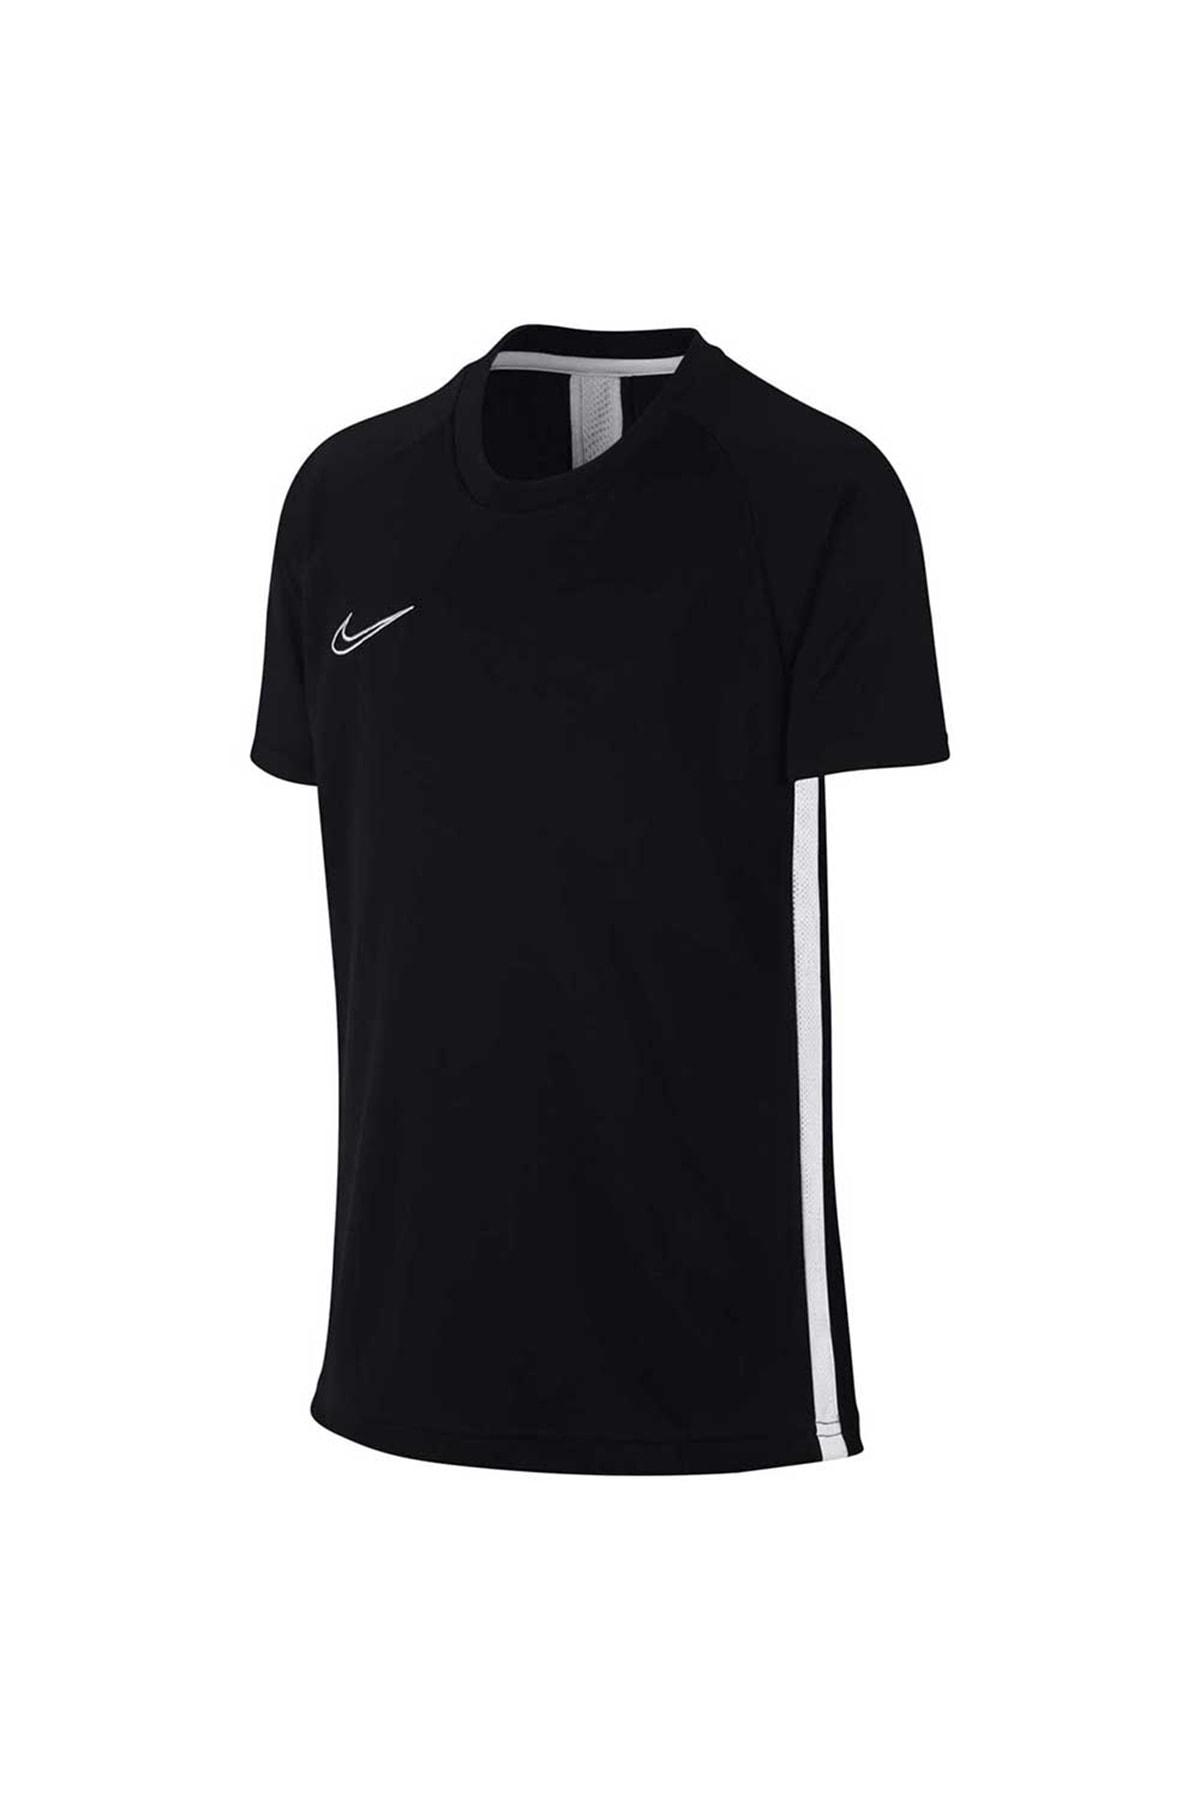 Nike Ao0739-010 Dri-Fıt Academy Çocuk Tişörtü 1